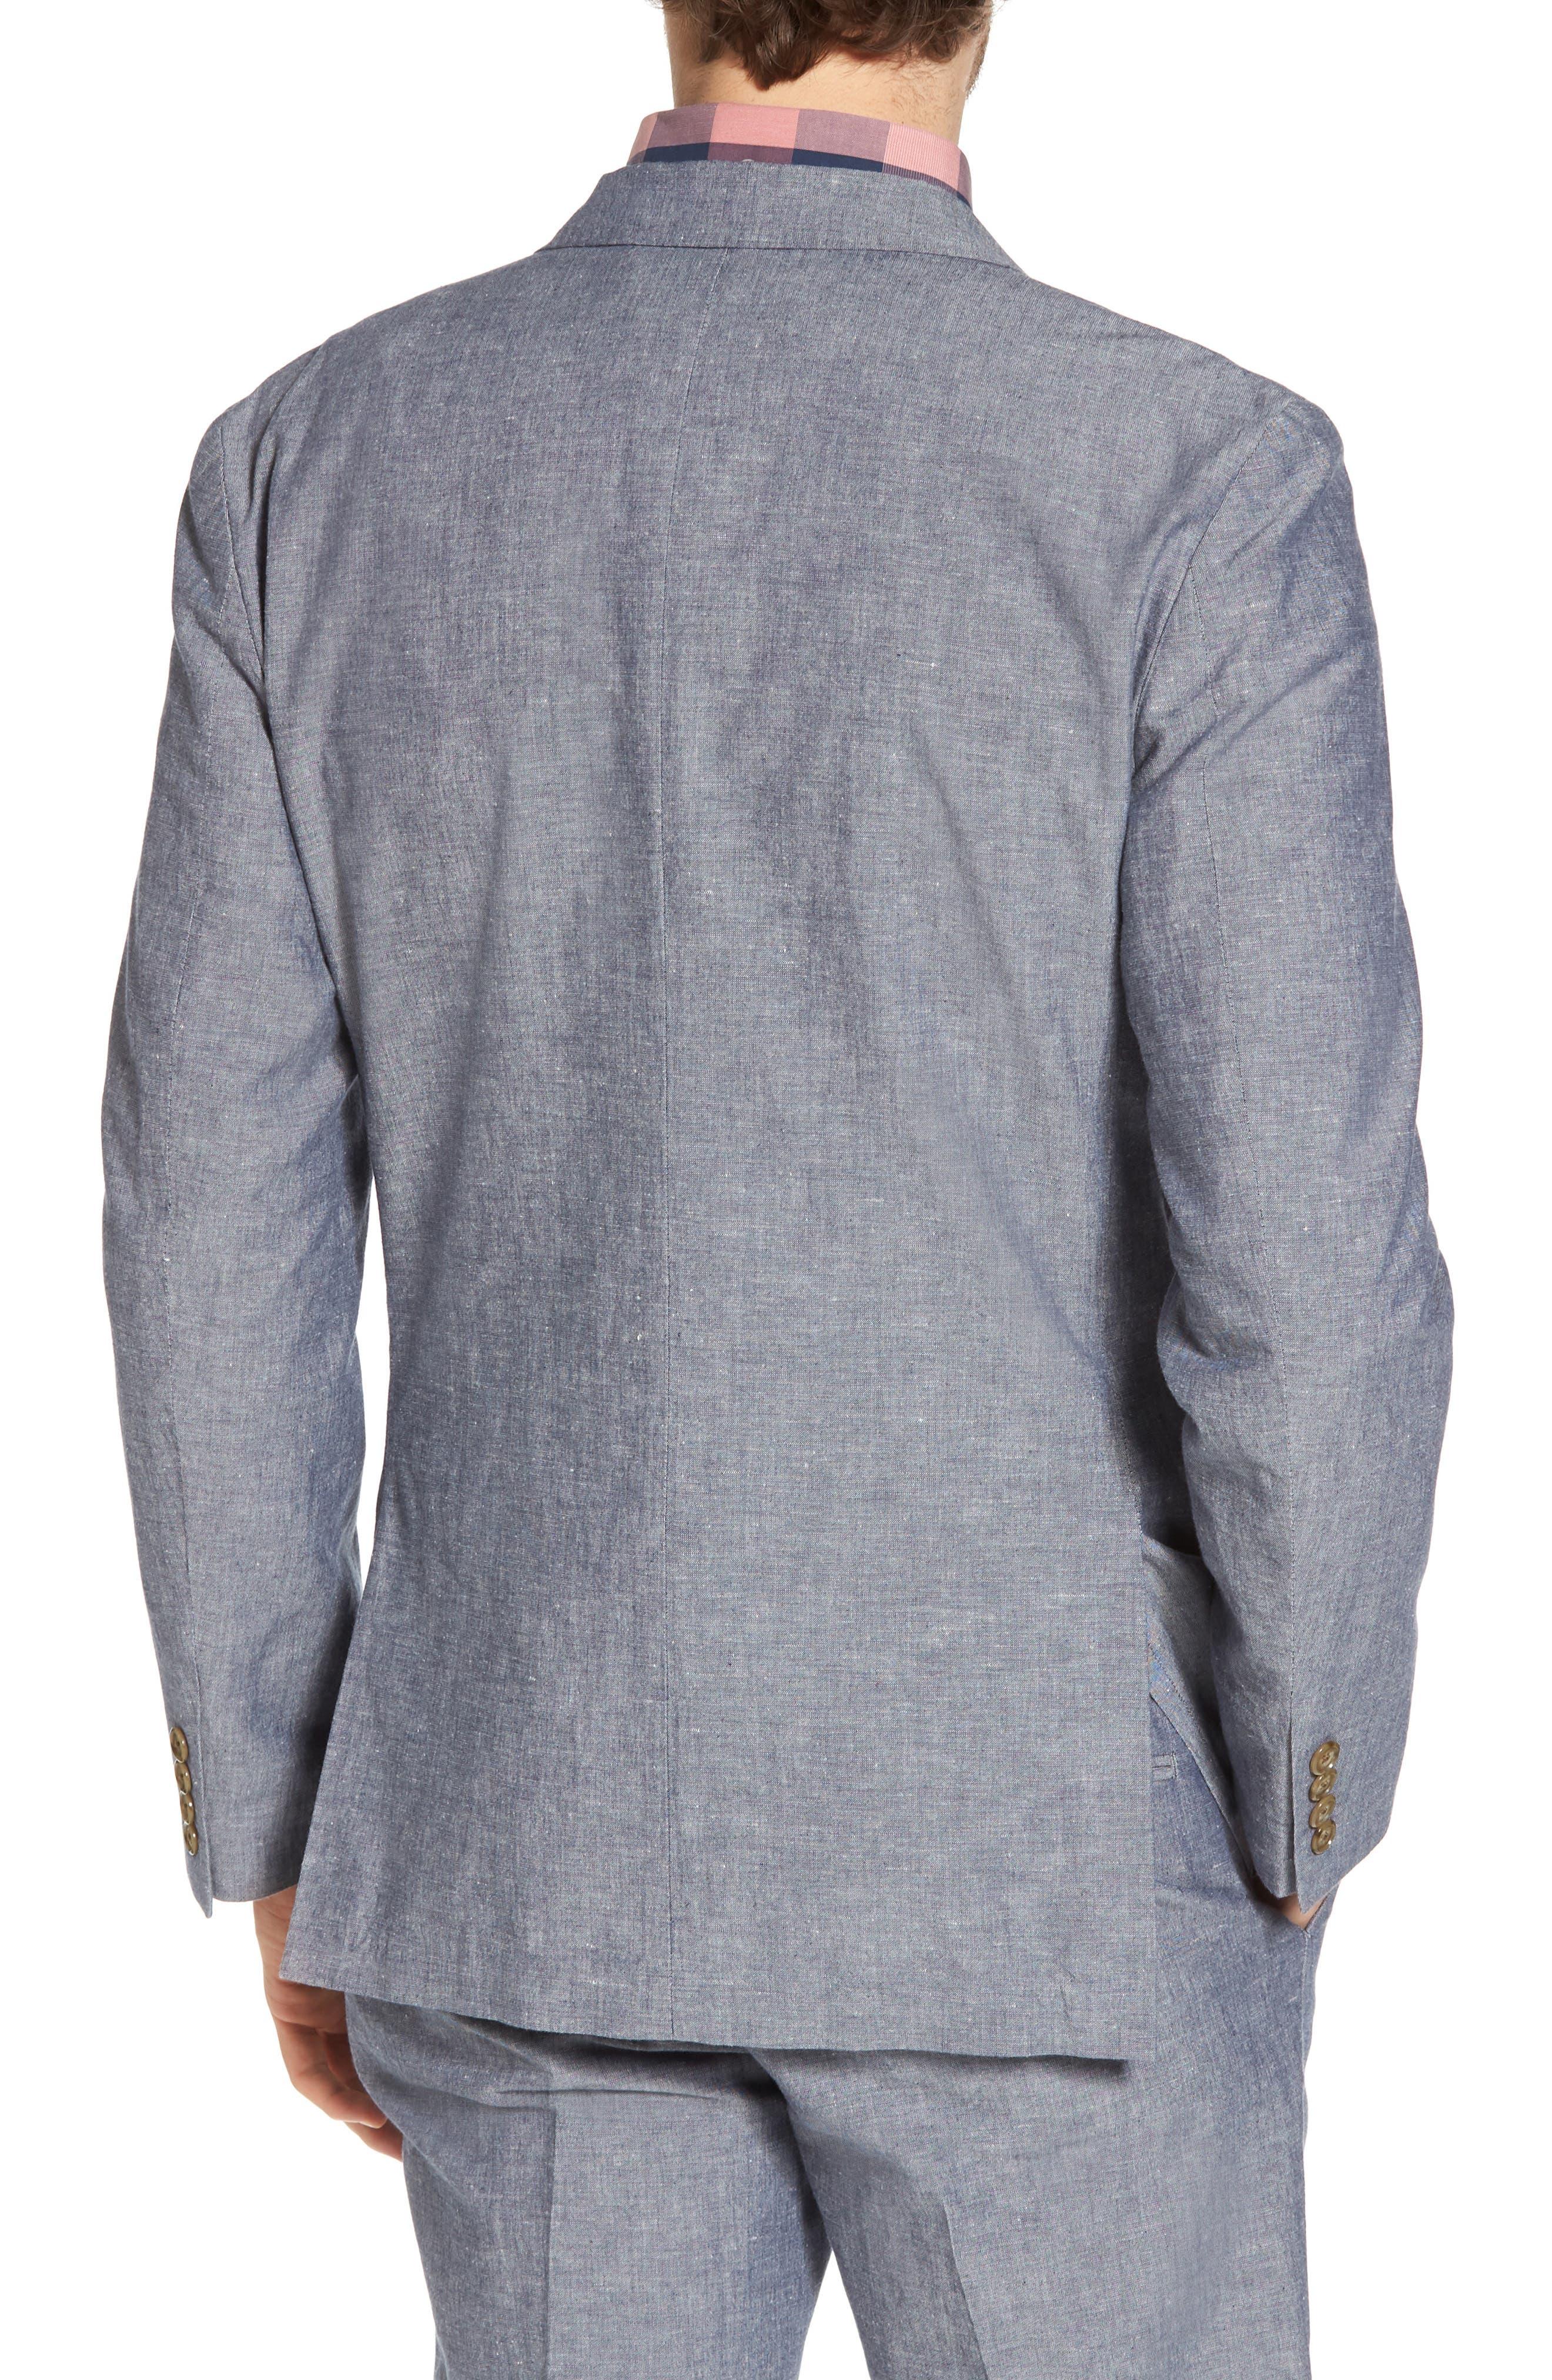 Ludlow Cotton & Linen Blazer,                             Alternate thumbnail 2, color,                             Deep Water Blue